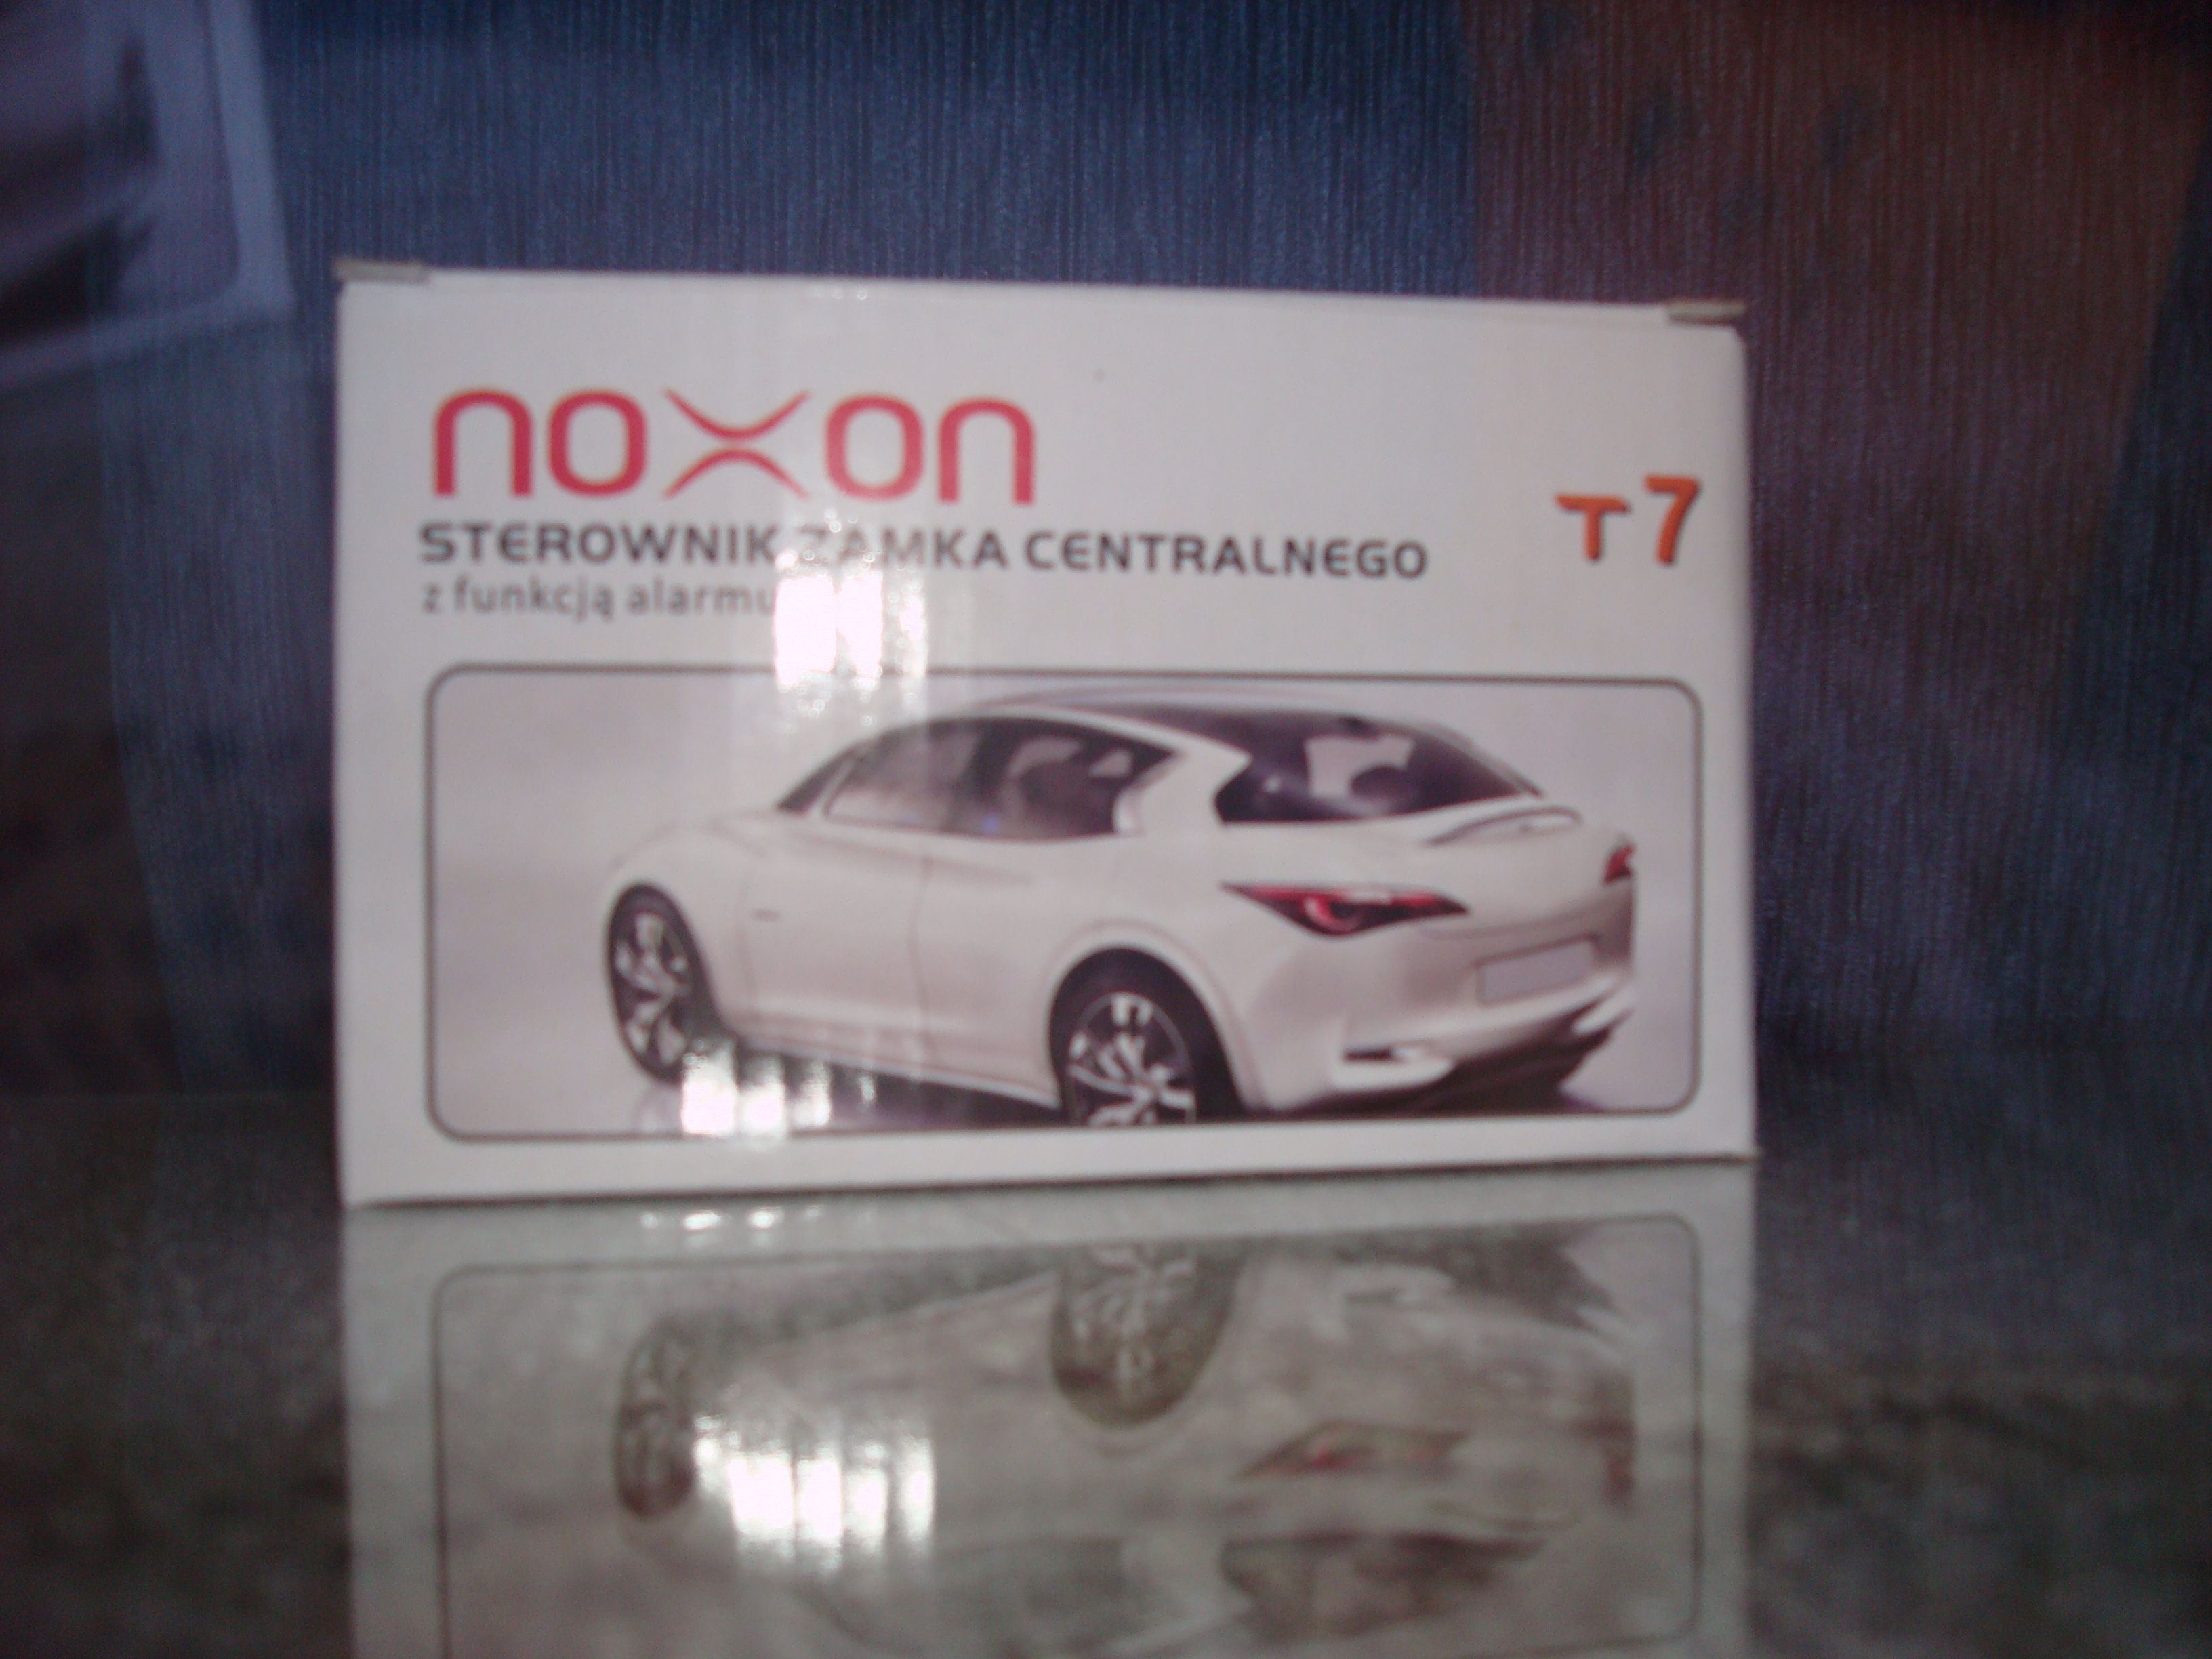 Sterownik centralnego zamka Noxon T7